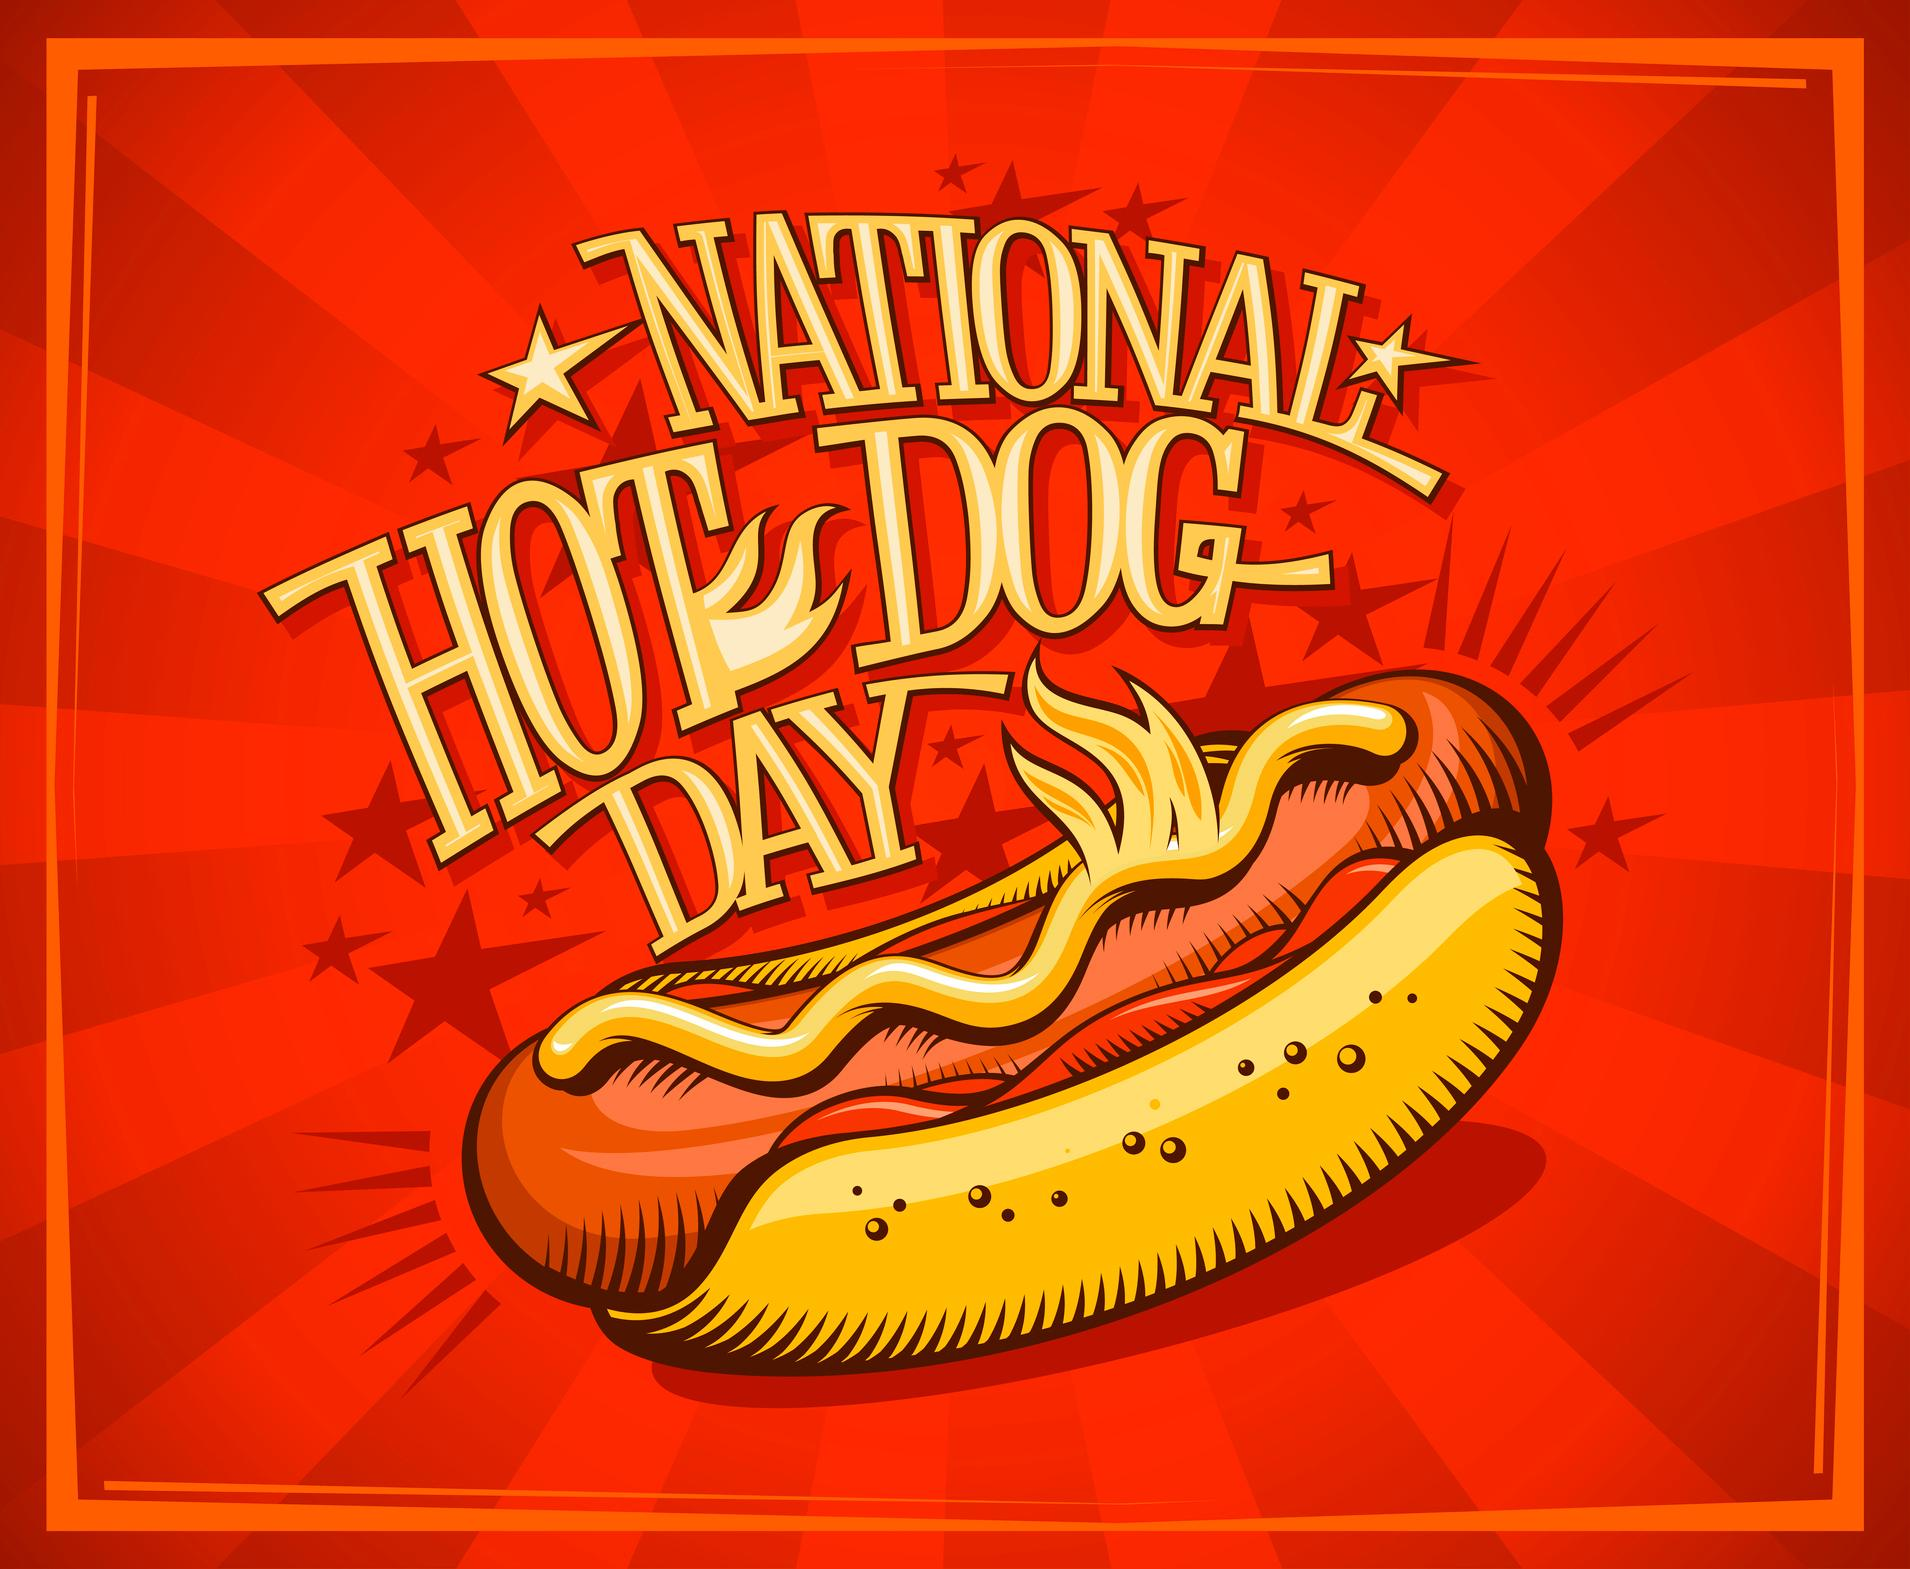 national-hot-dog-day-deals-2-1563300883243.jpg